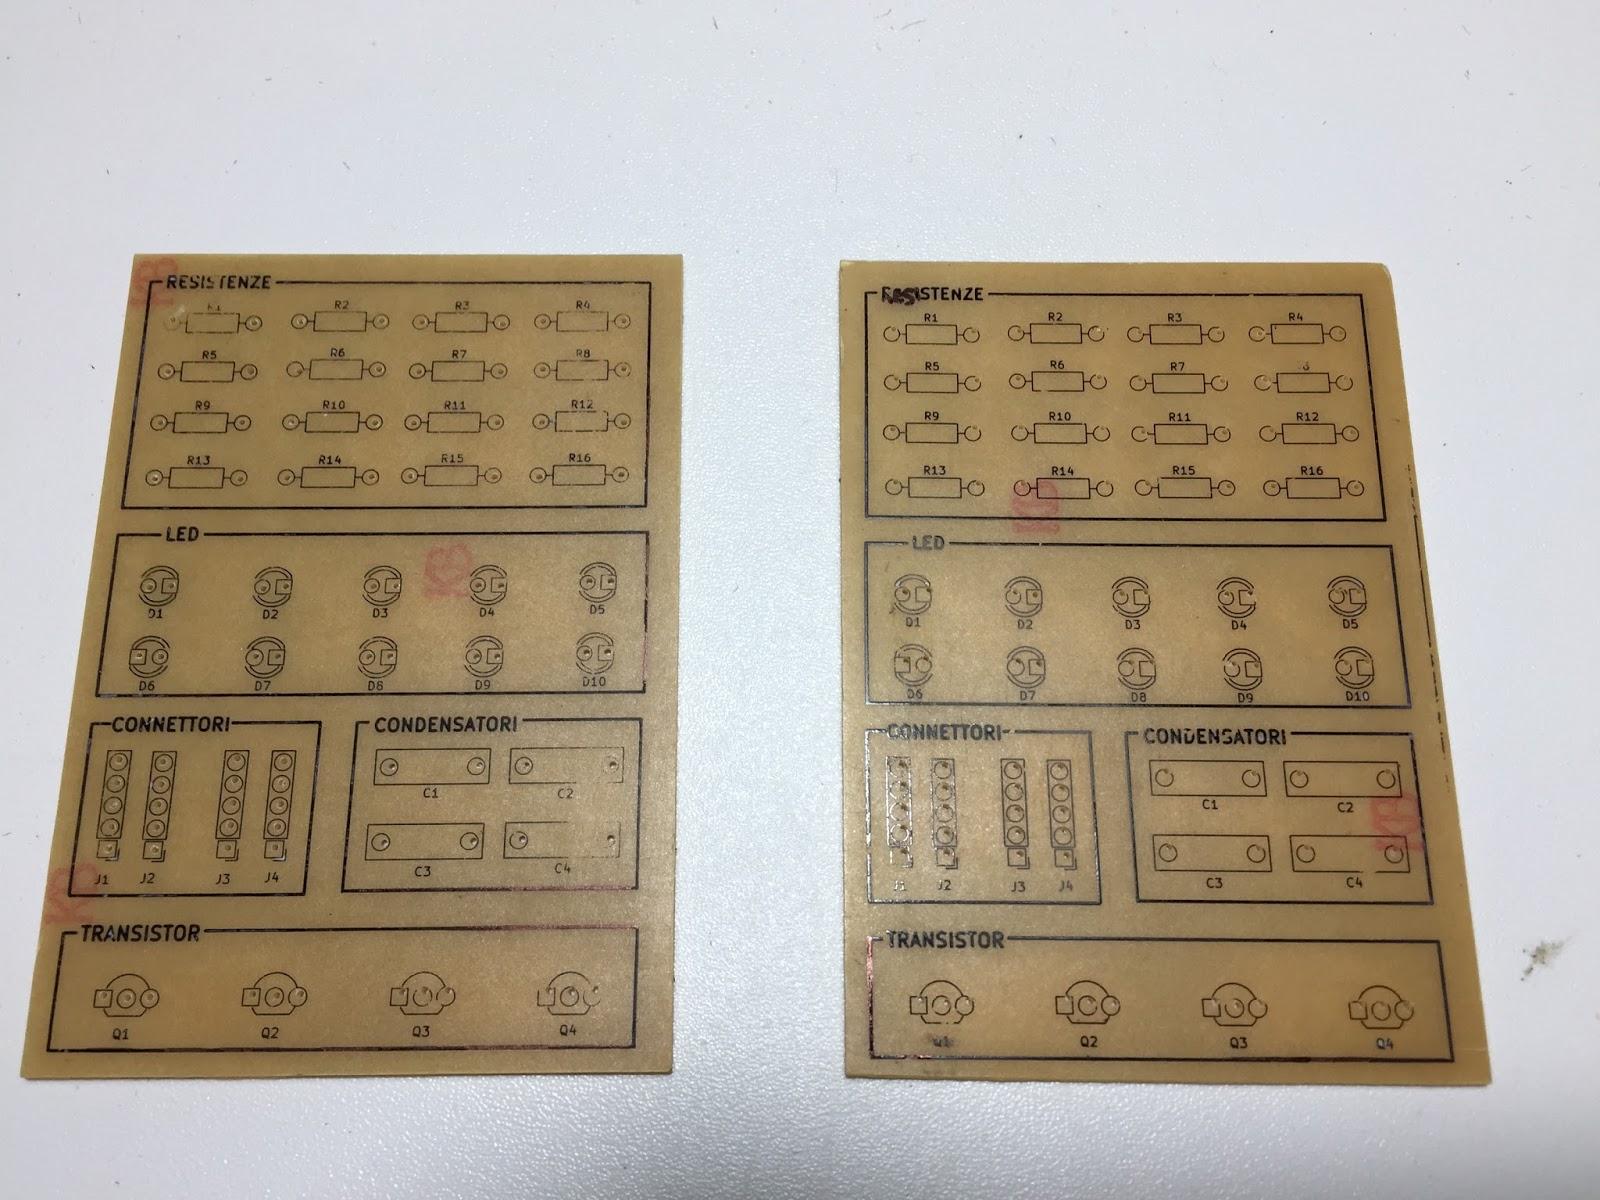 Schema Elettrico Led : Antonio mancuso s kit mini lampeggiatore led